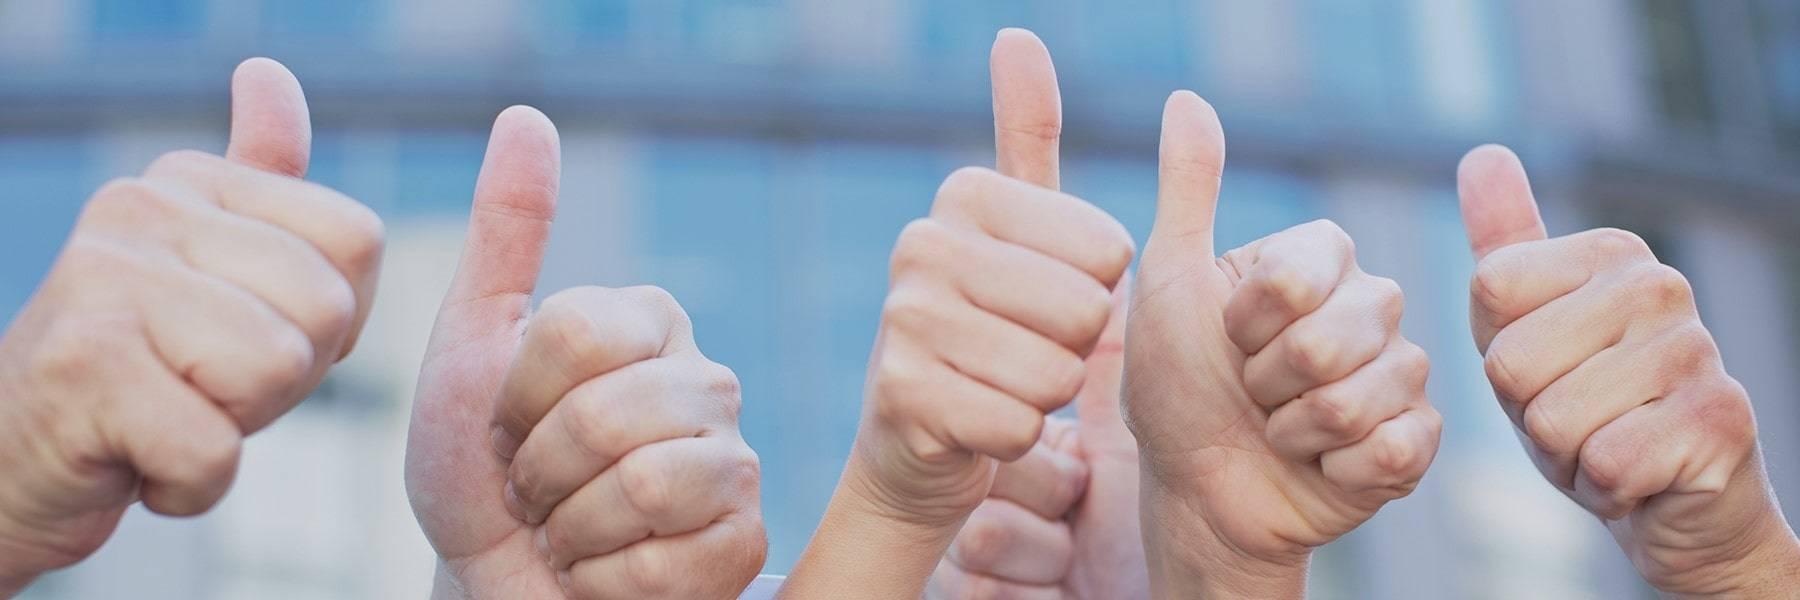 HypotheekStore Reviews - De HypotheekStore